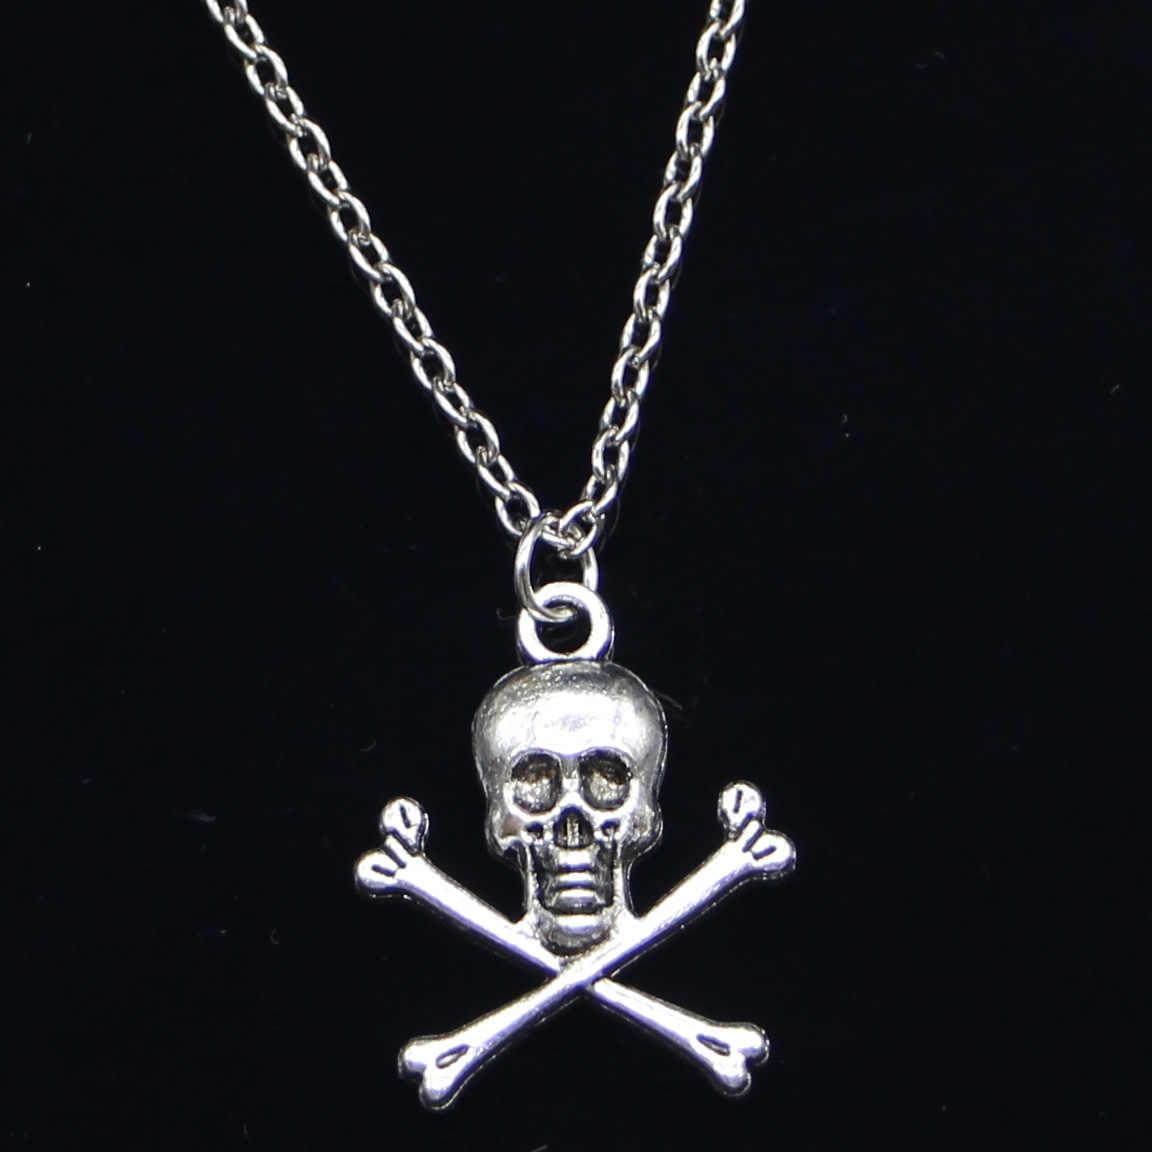 Skeleton Bone Necklace